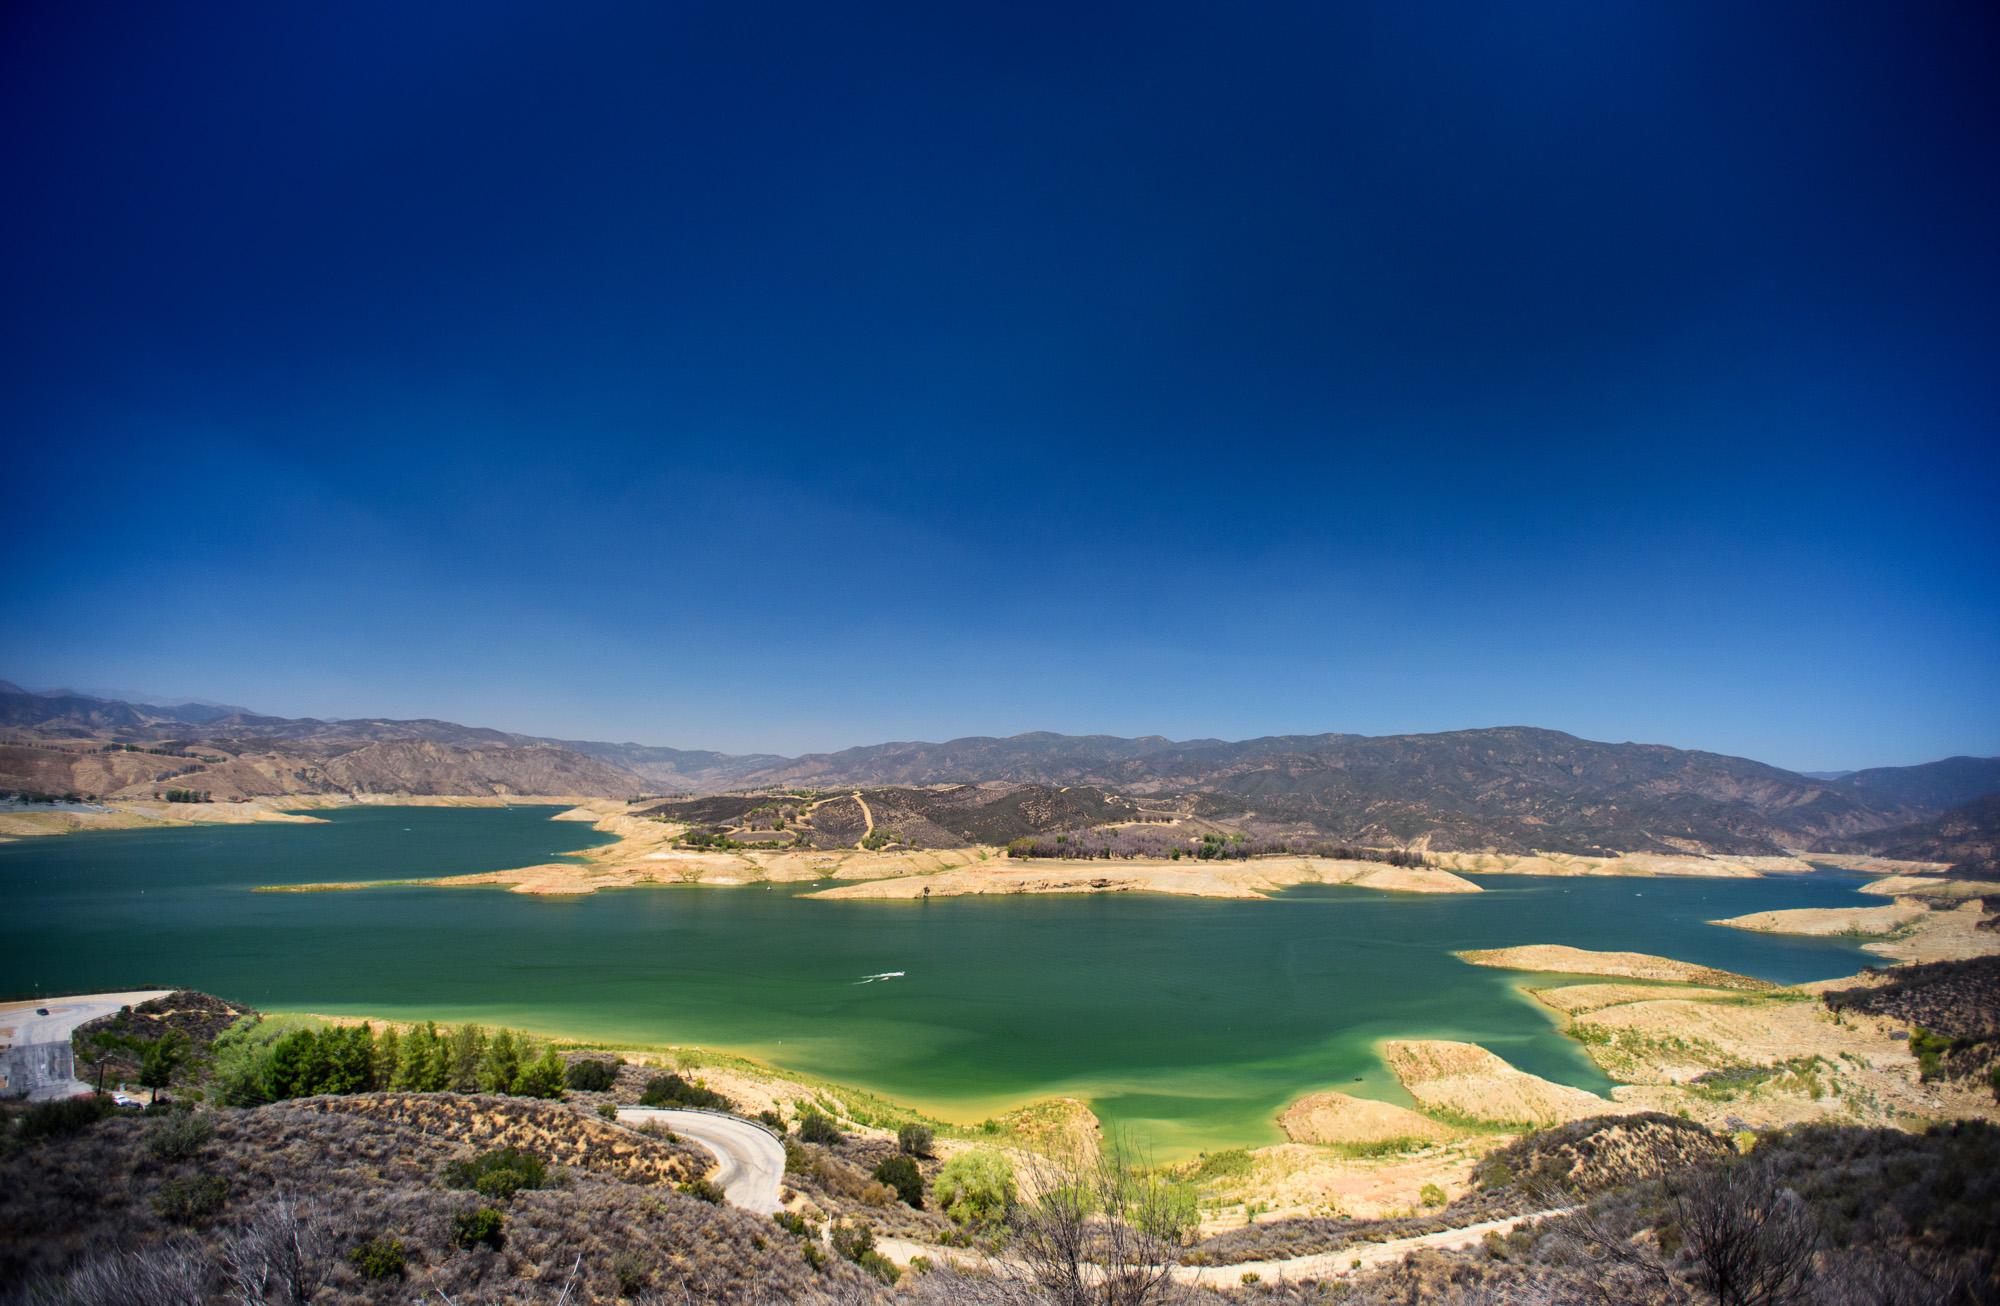 castaic_lake_reservoir_brittany_app.jpg